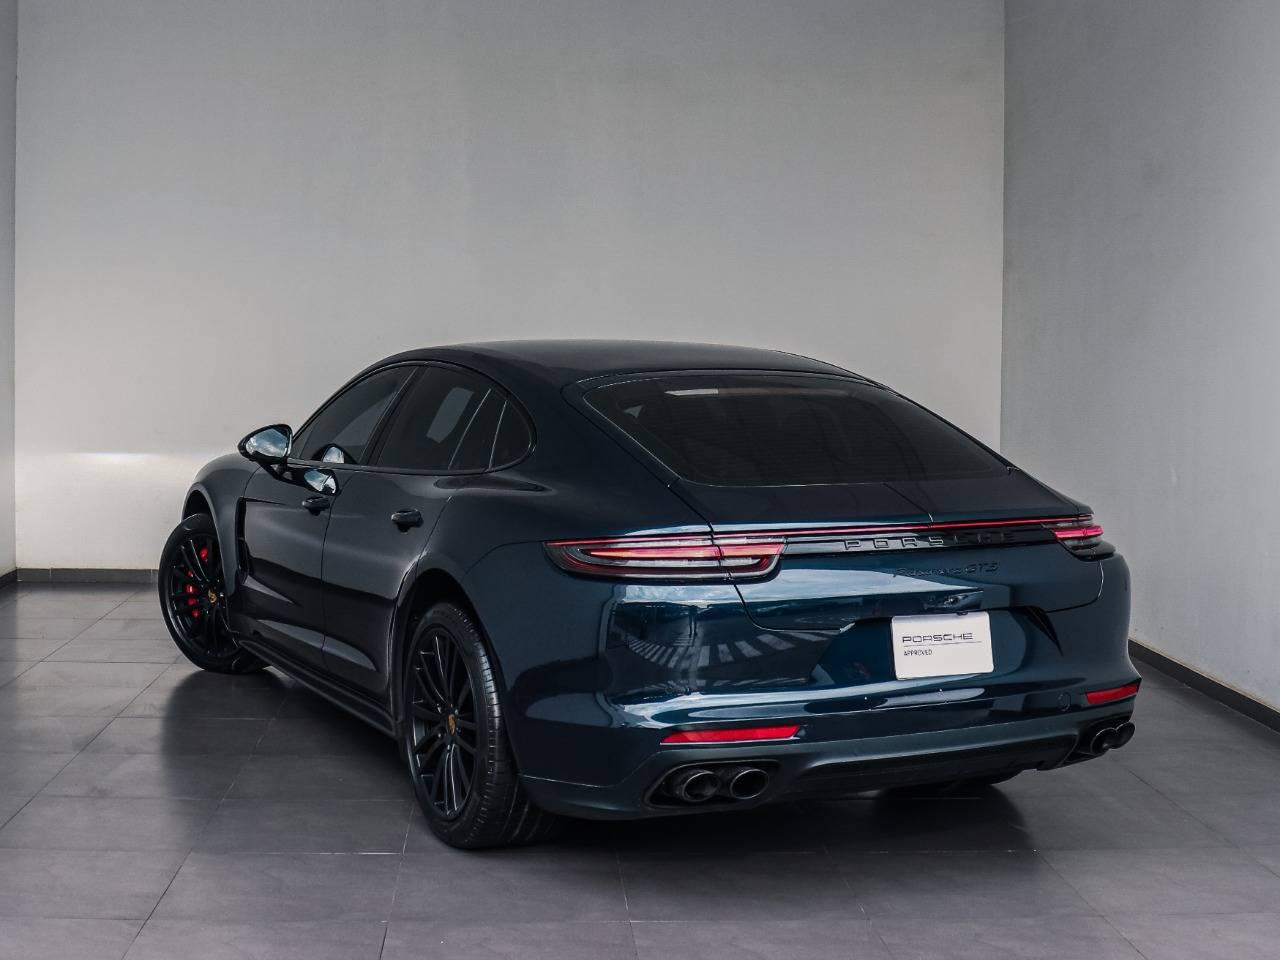 2019 Porsche Panamera GTS – 3